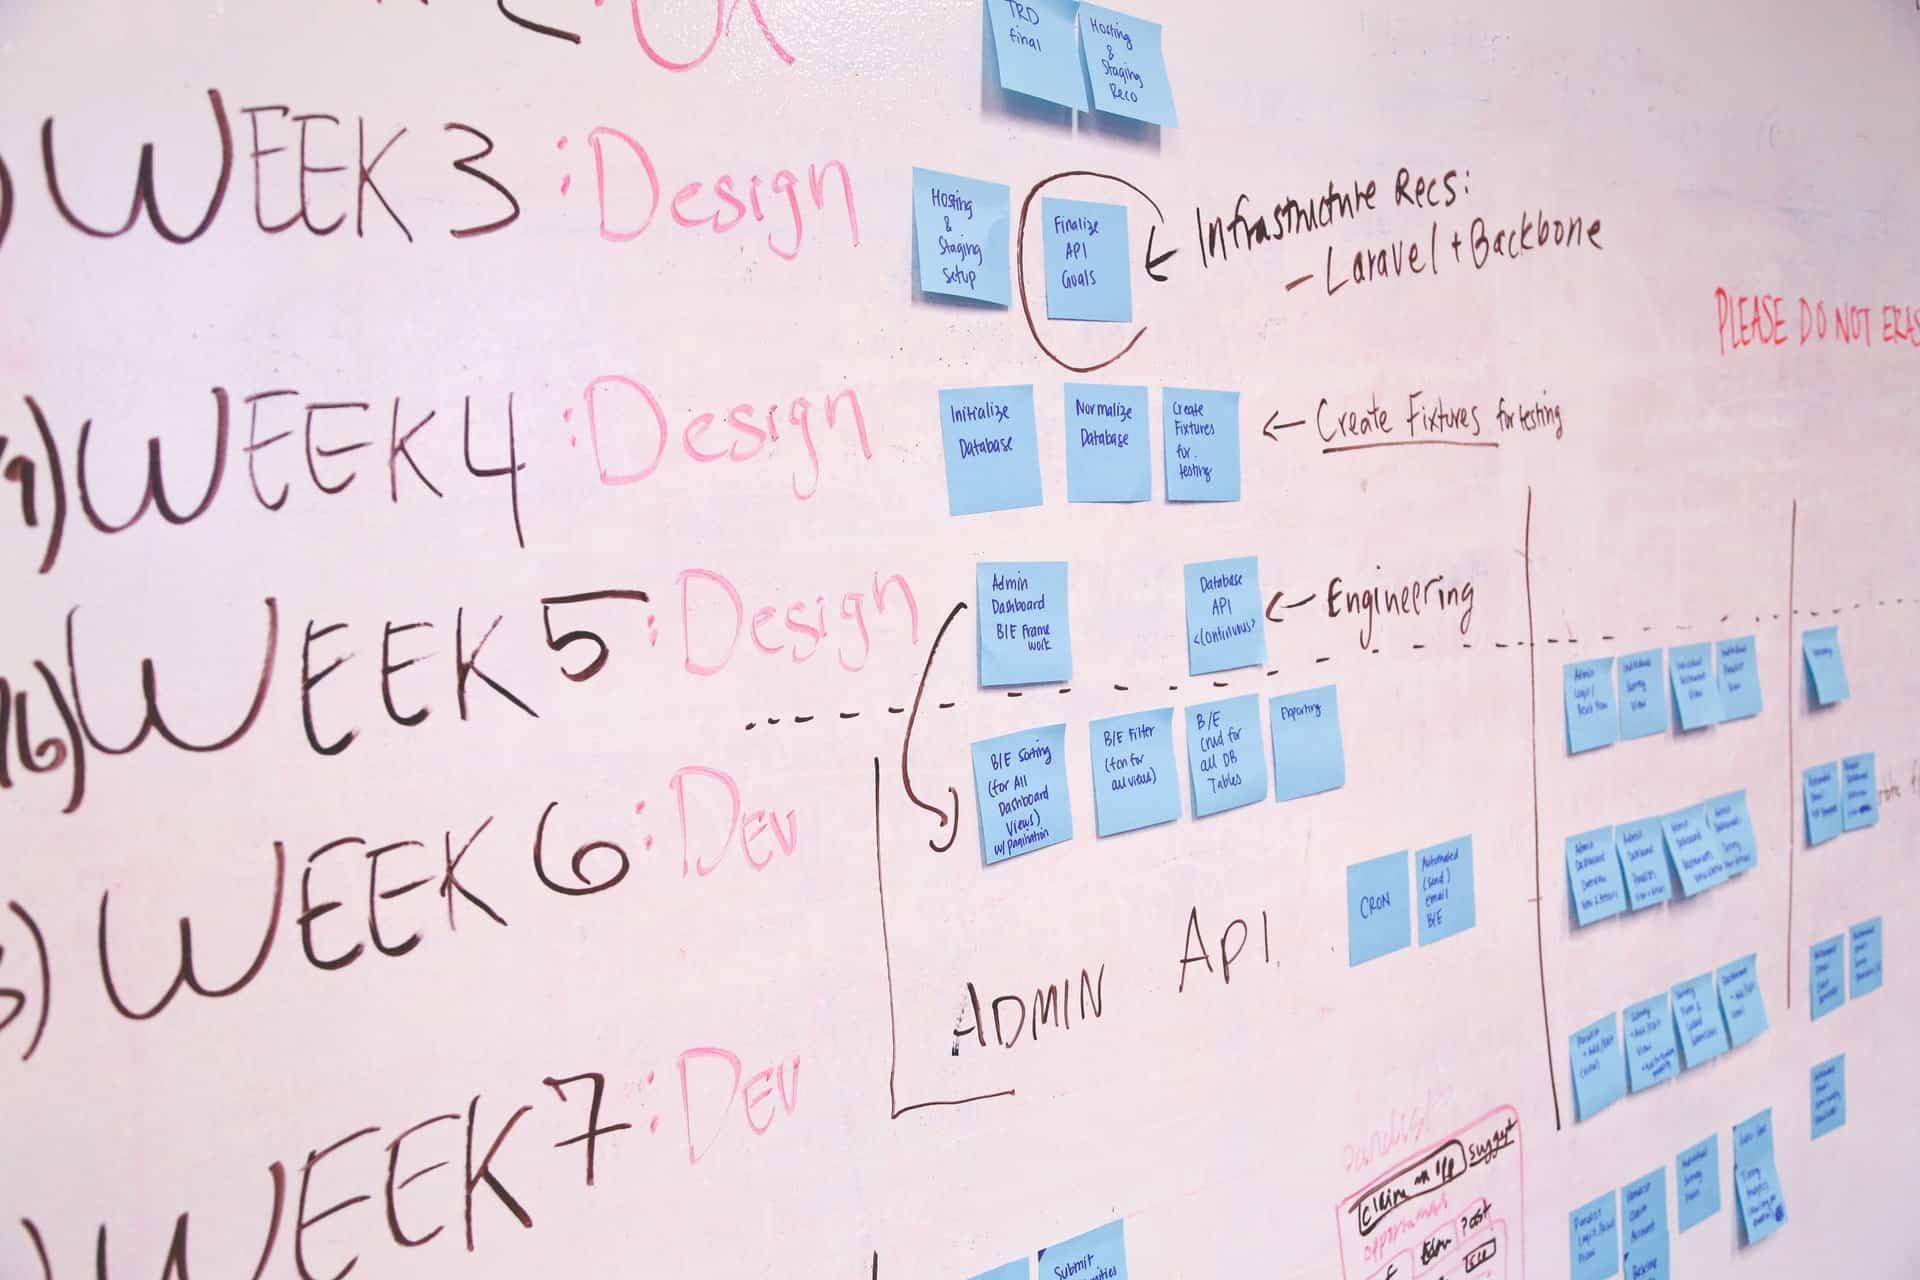 Project plan on whiteboard